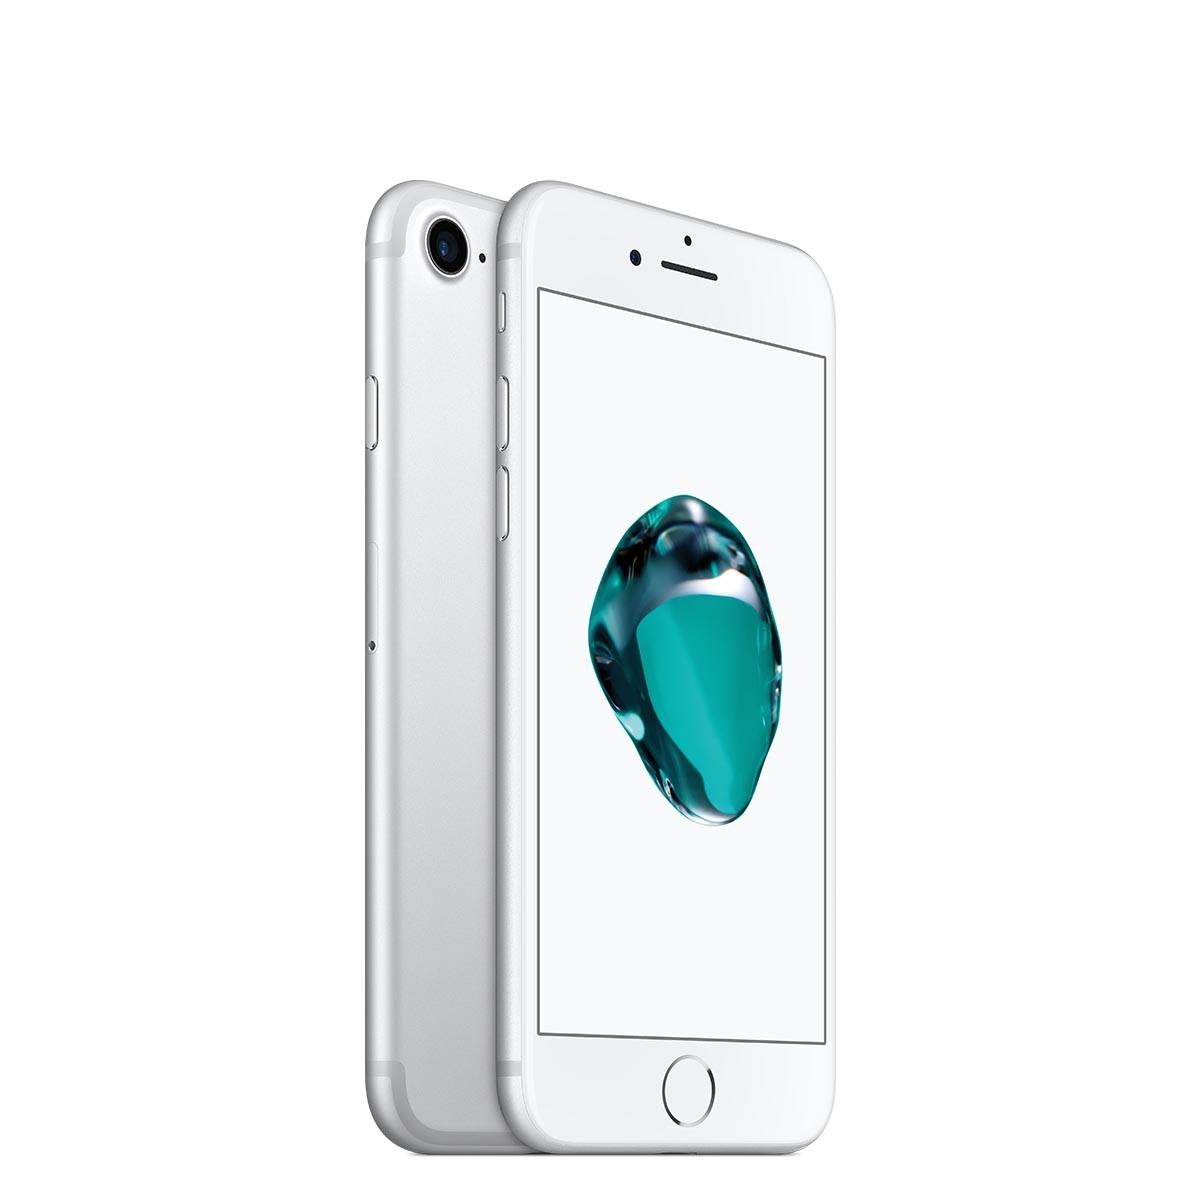 Apple iPhone 7 32GB - Silver